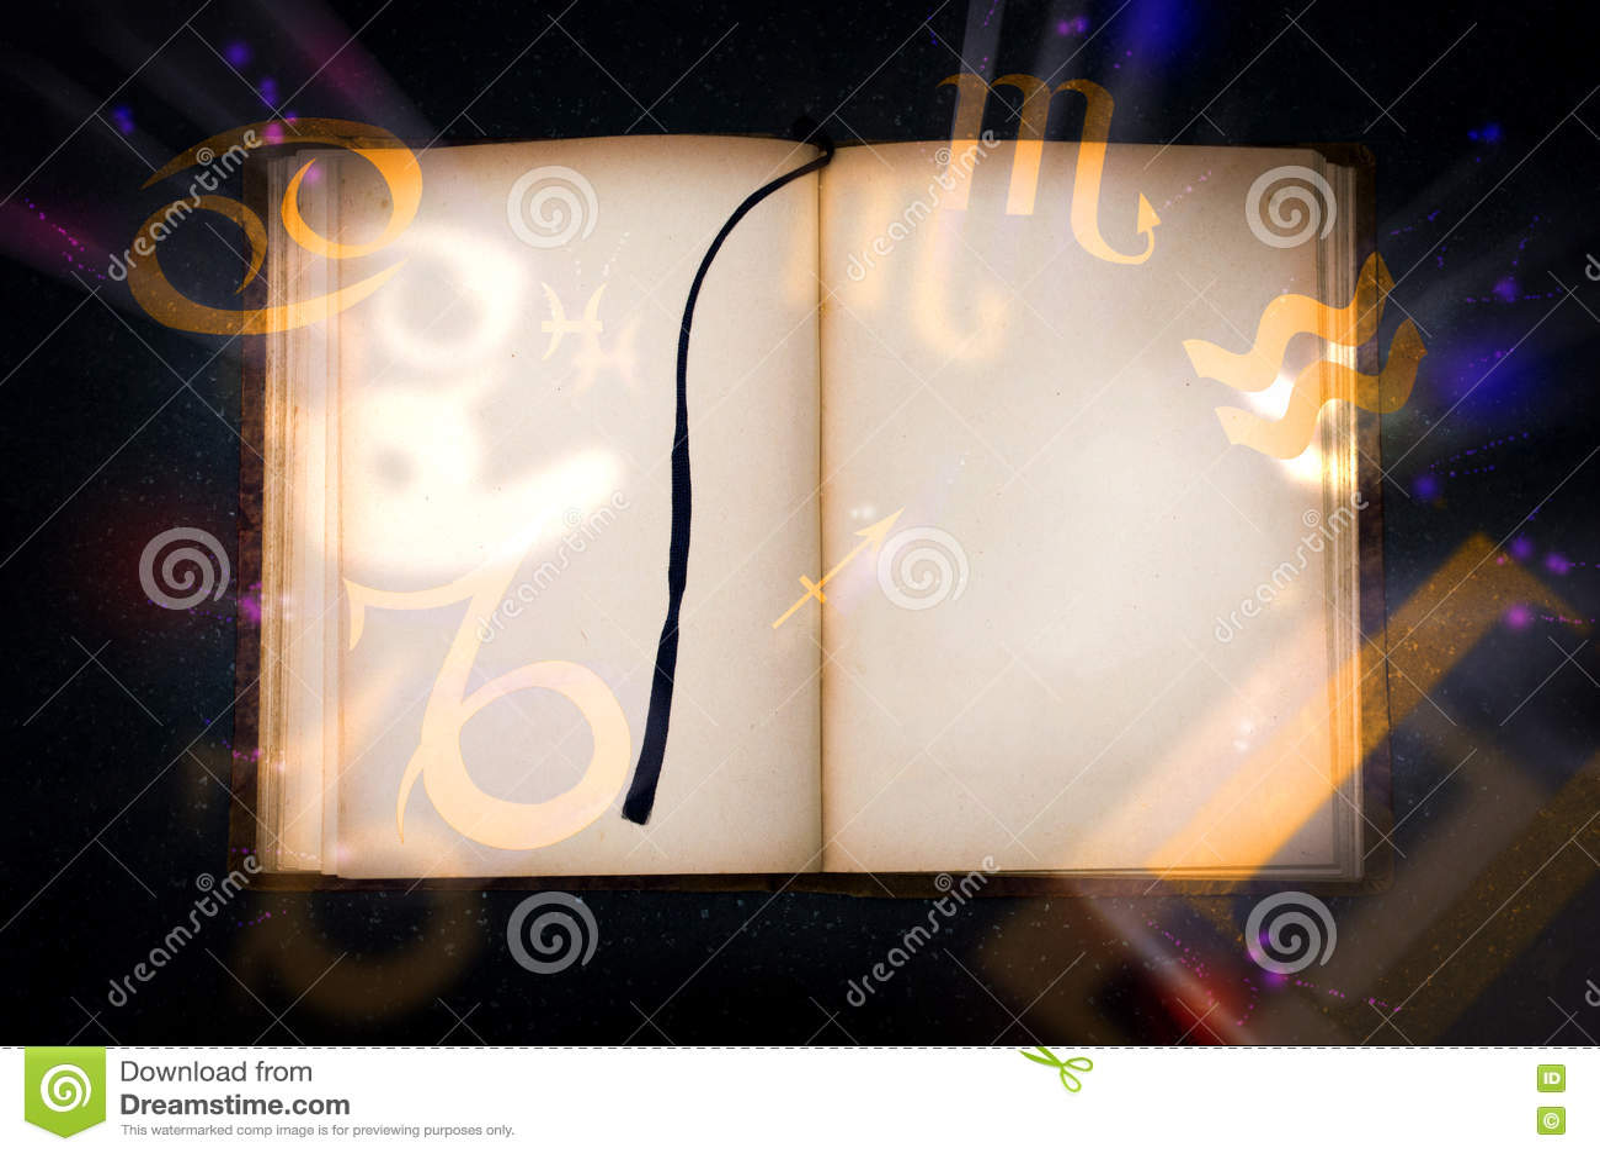 Old magic book with glowing zodiac symbols